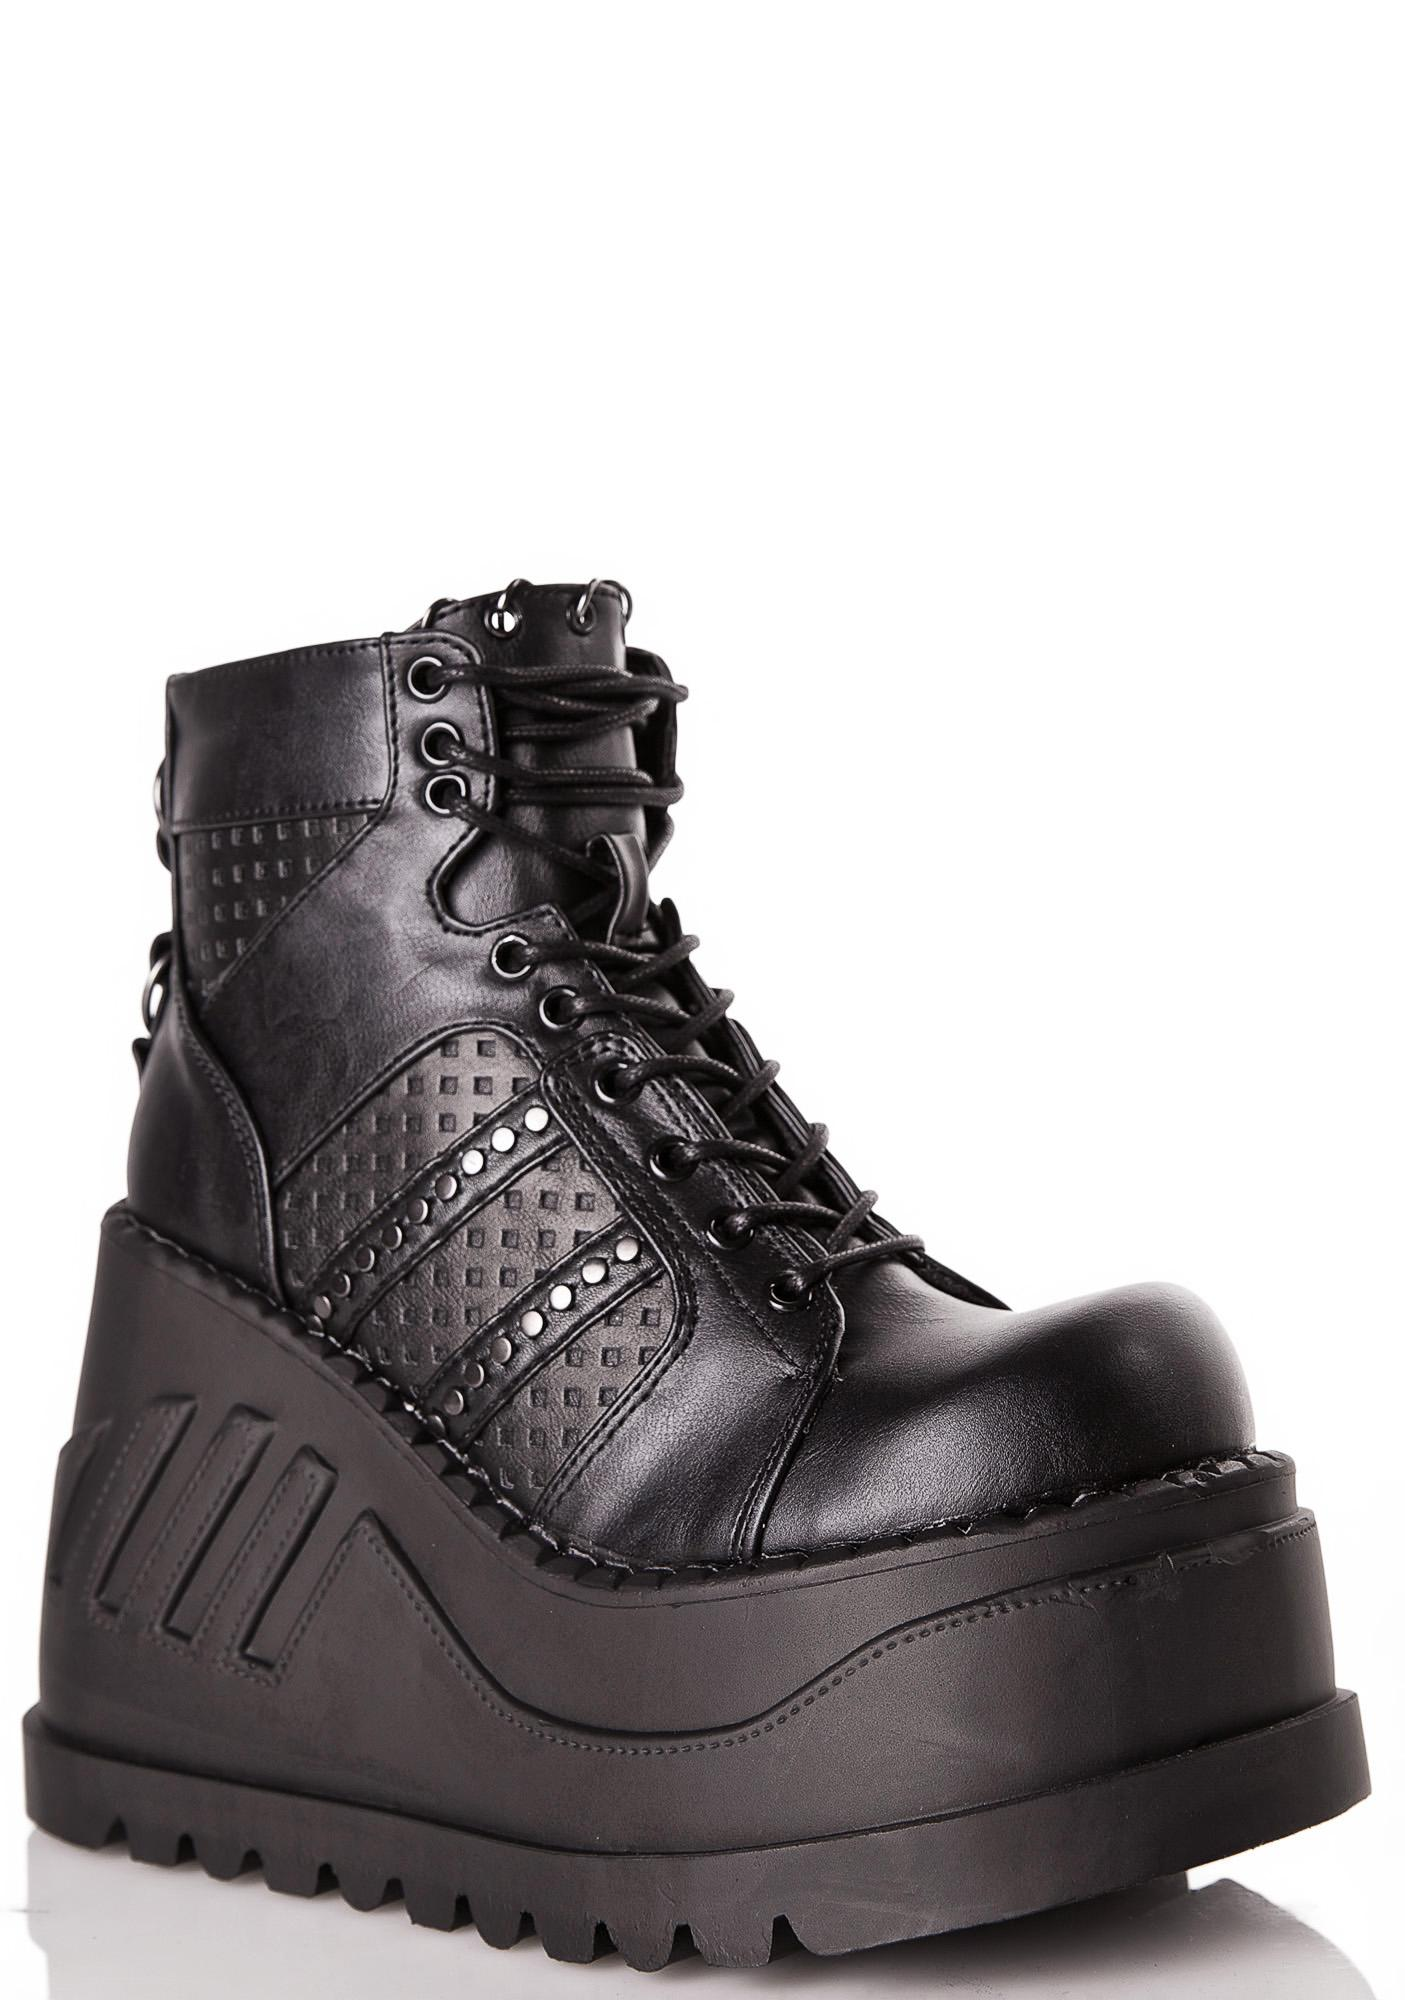 Demonia Analog Stomp Boots